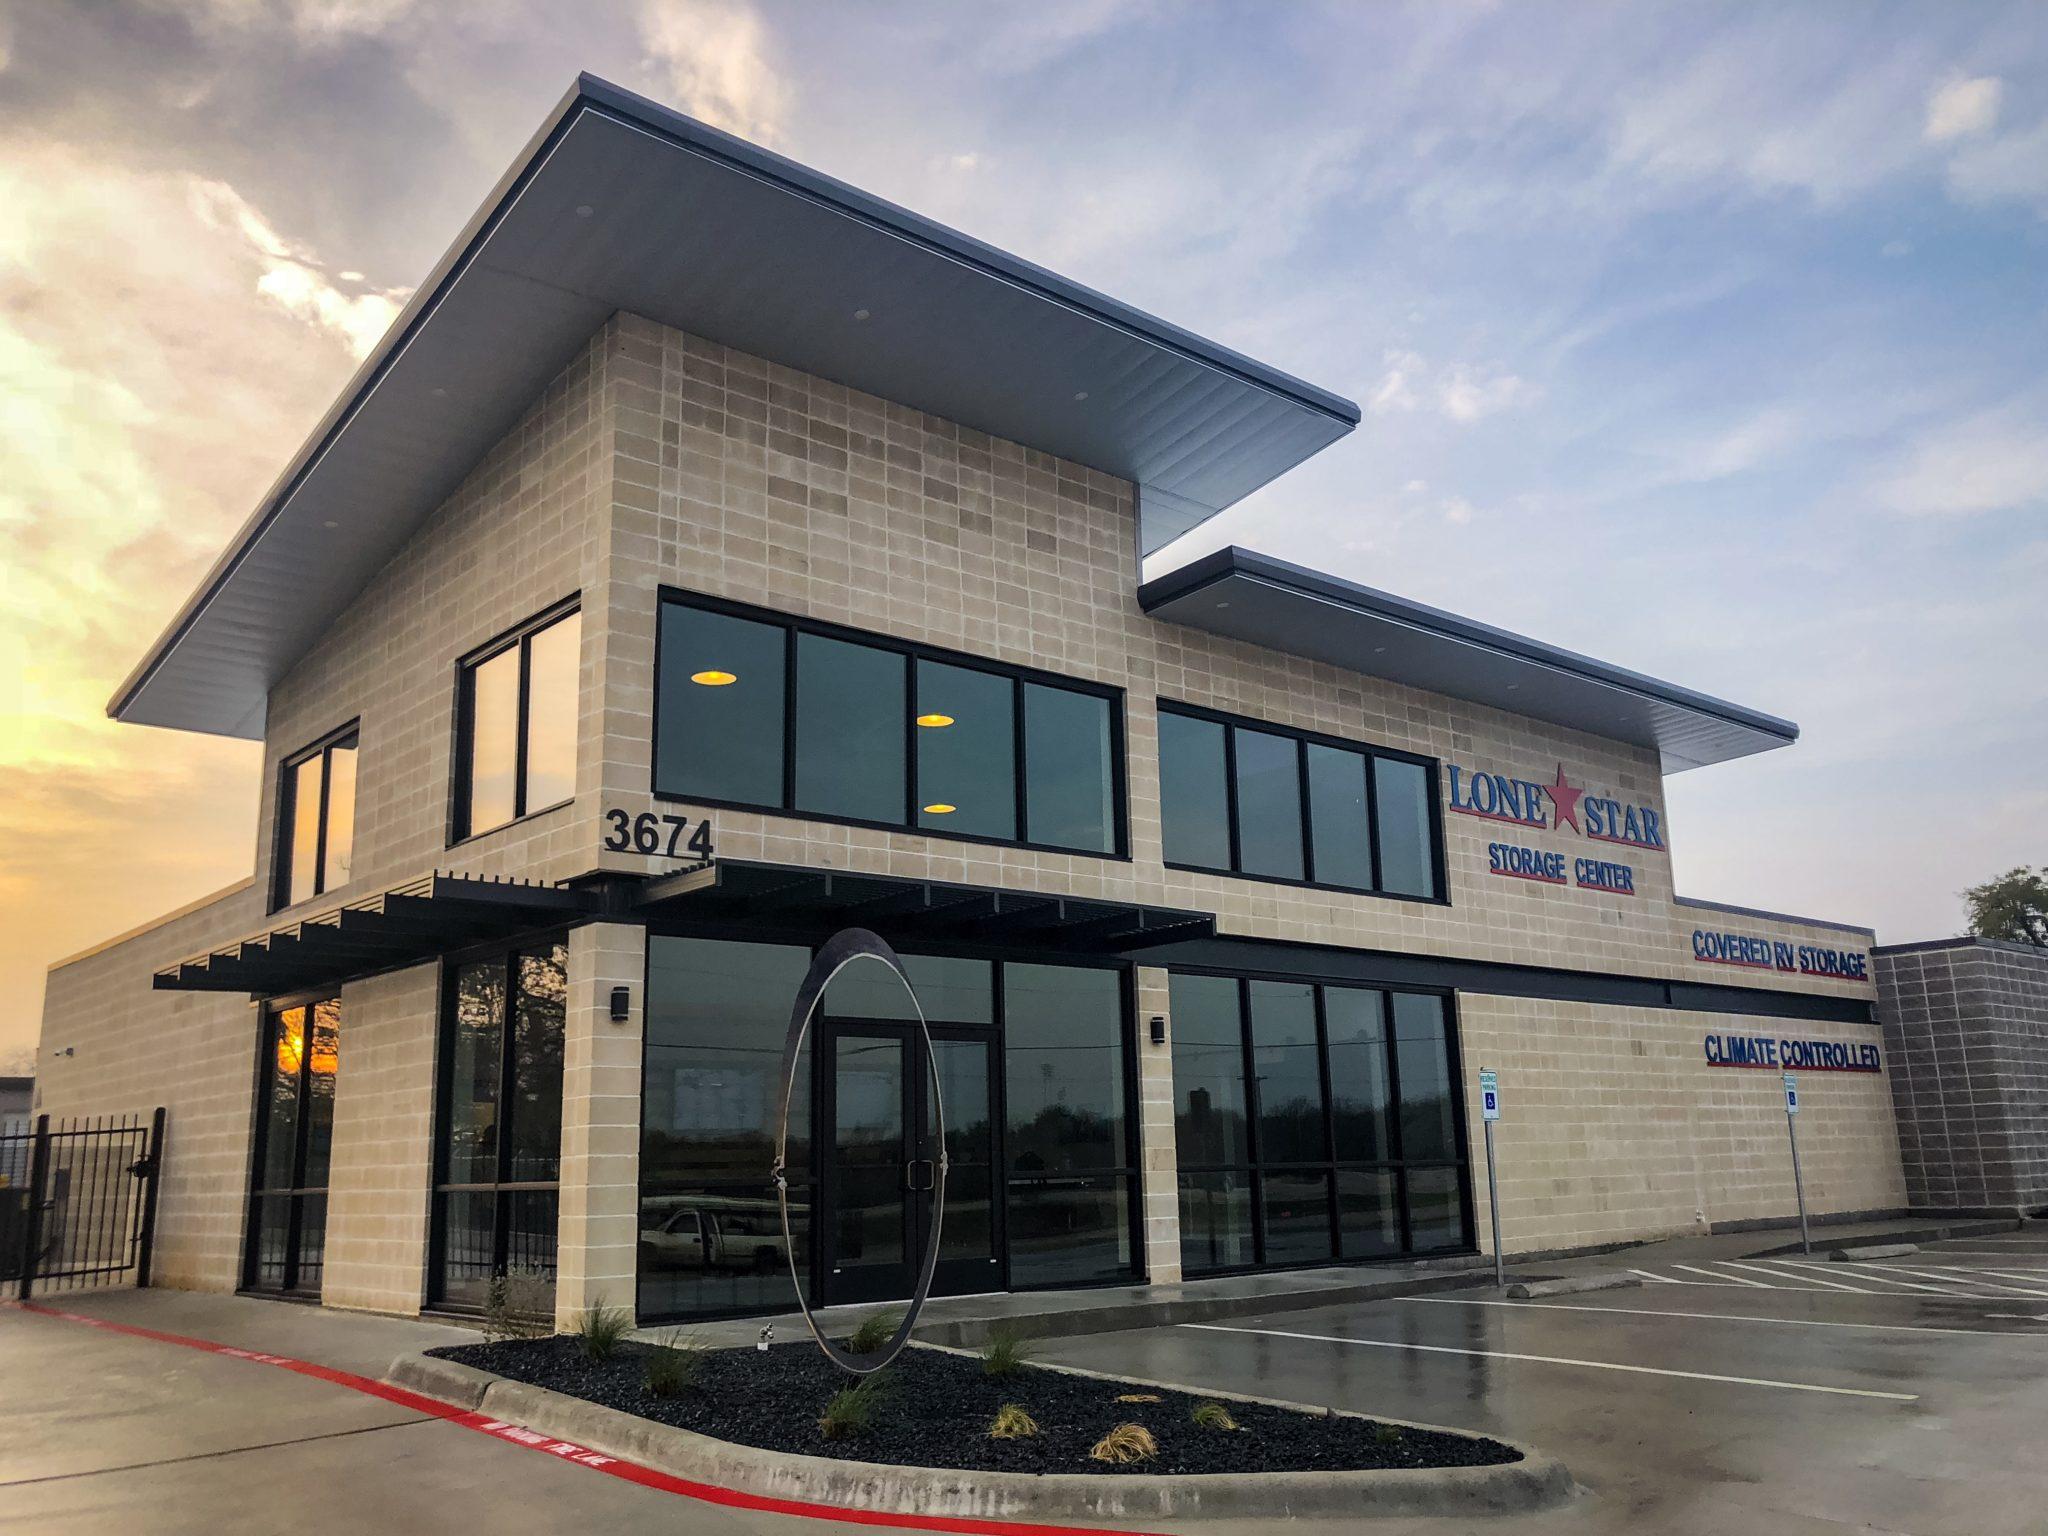 New Braunfels Texas Lone Star Self Storage